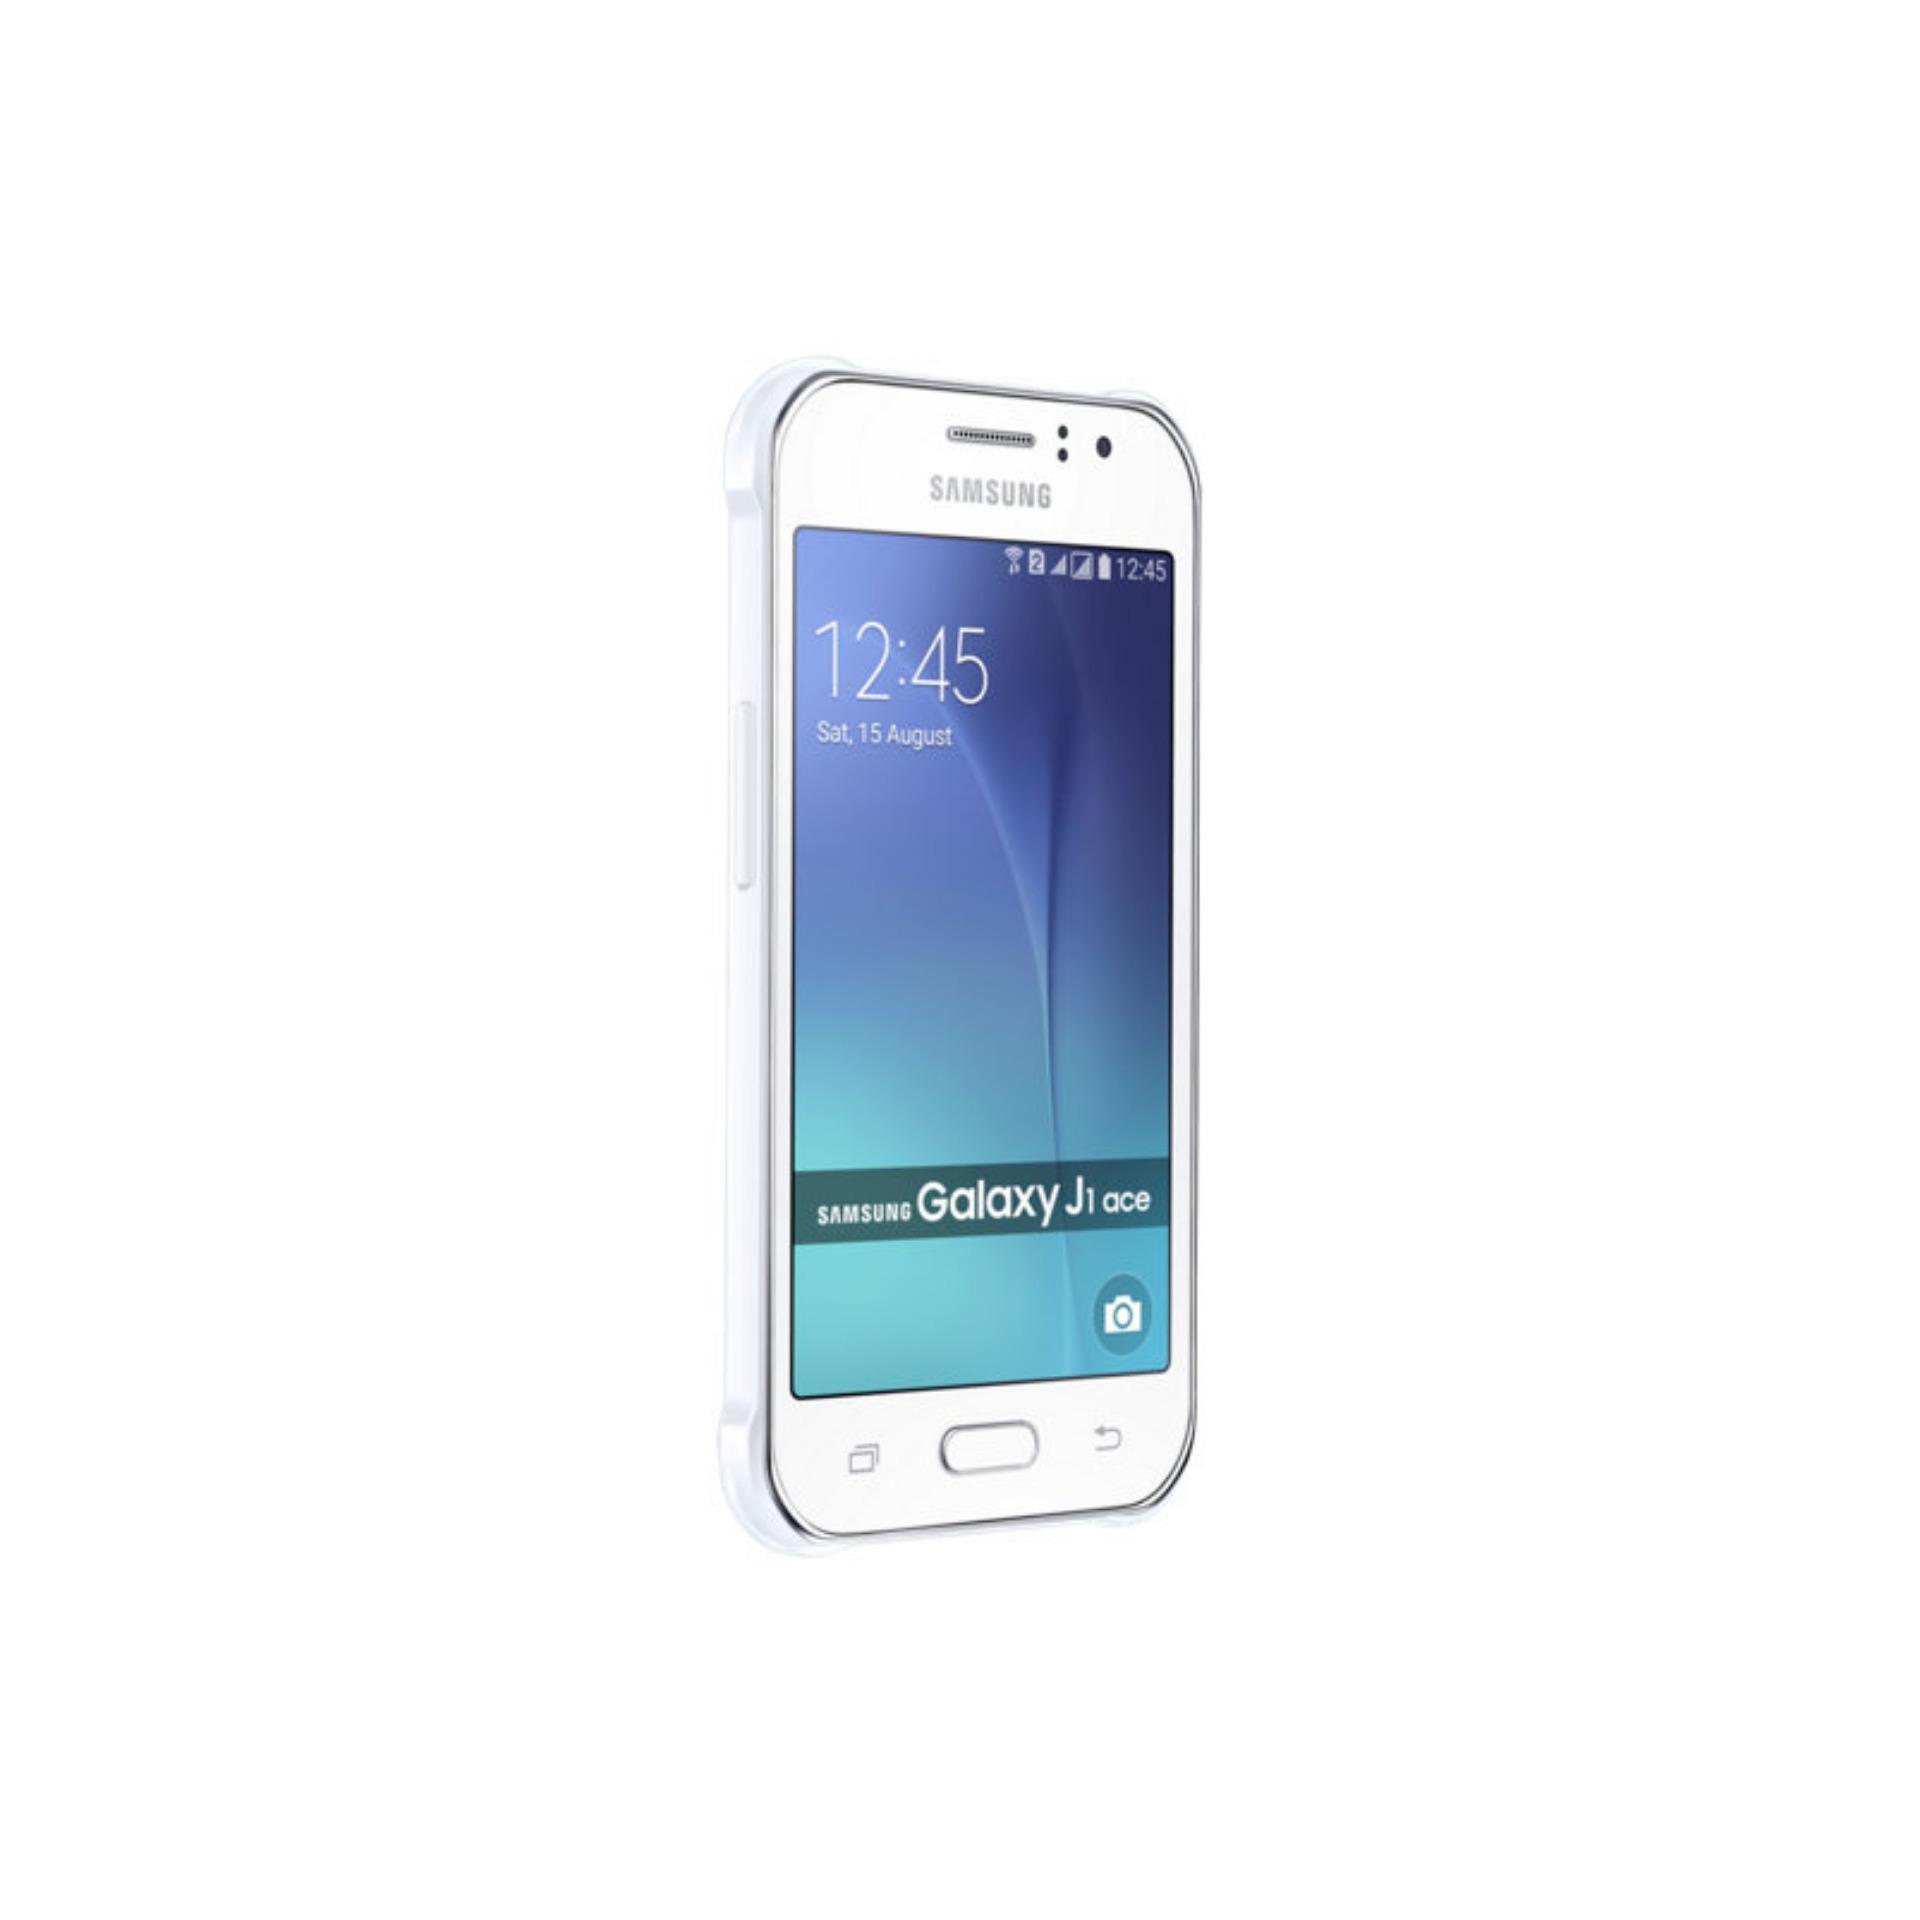 Ram 8 Gb Samsung Galaxy J1 Ace 2016 SM J111F 8GB